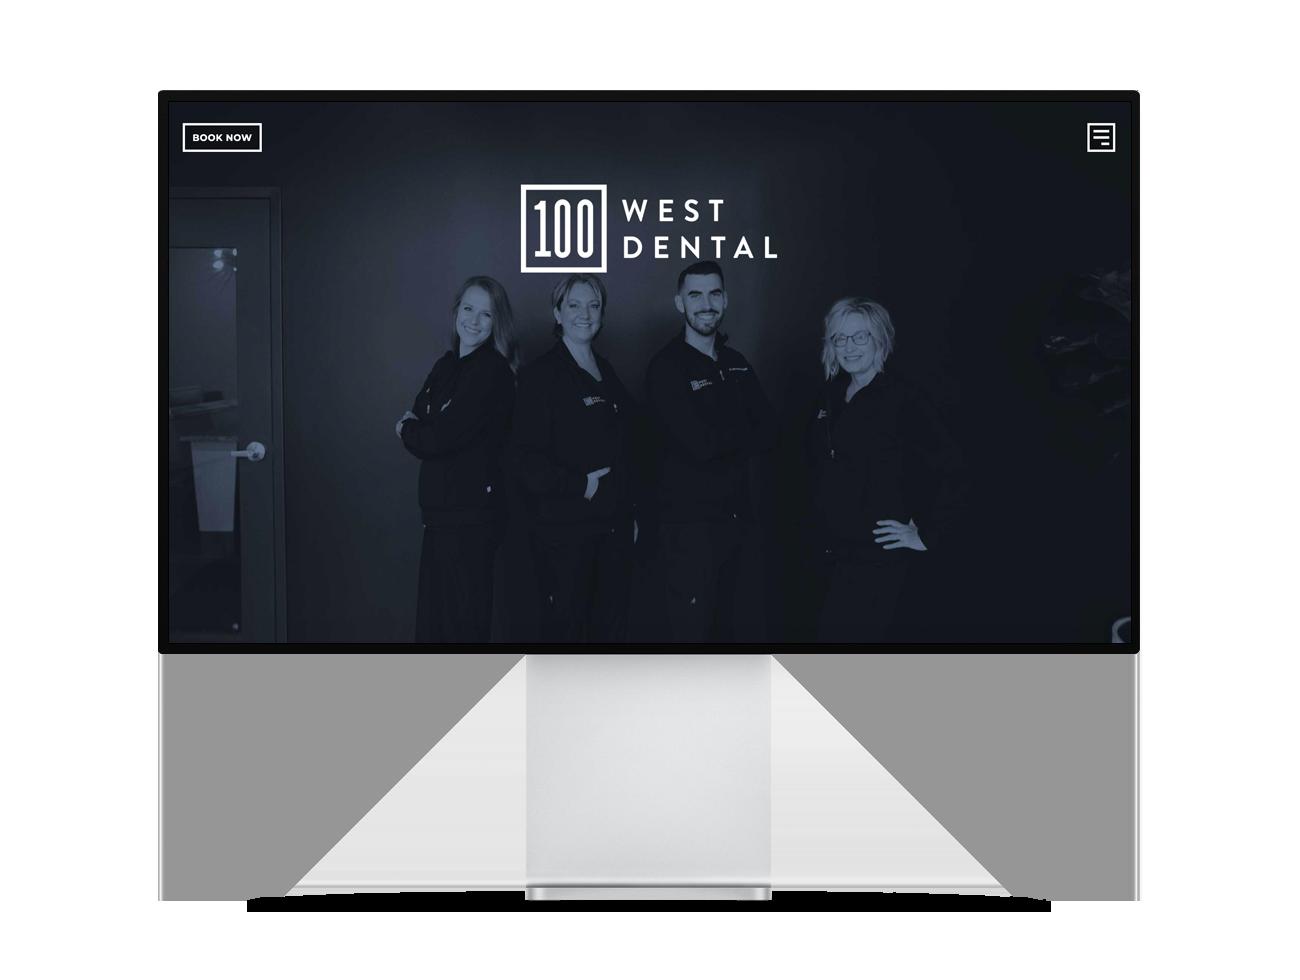 Screenshot of the 100 West Dental site